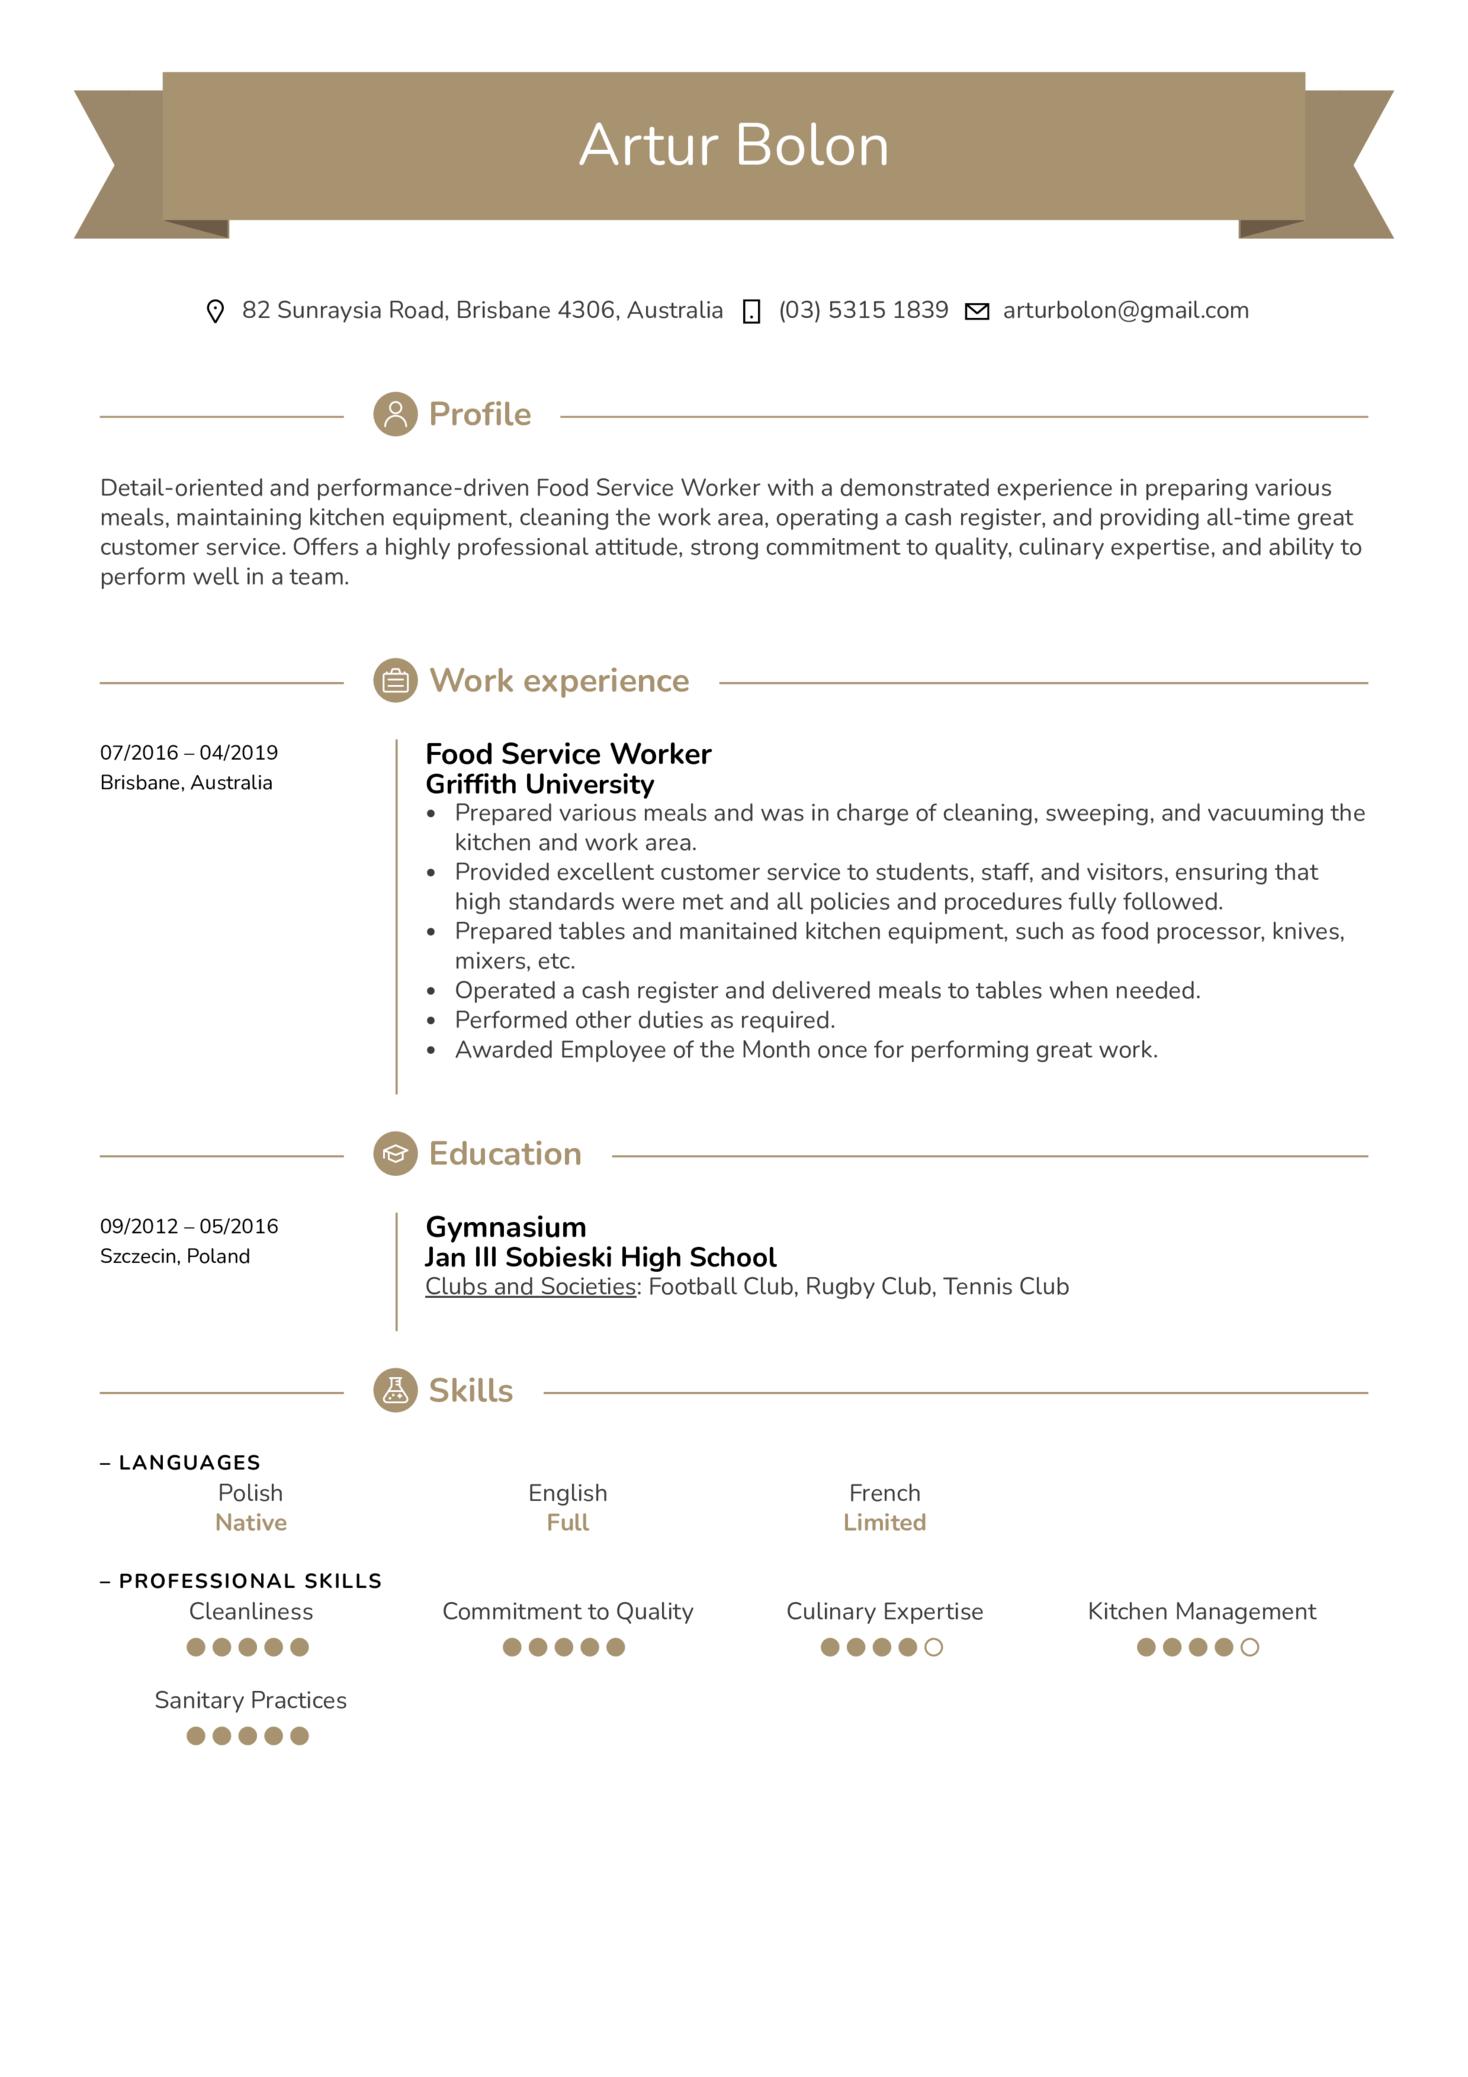 Food Service Worker Resume Sample (časť 1)